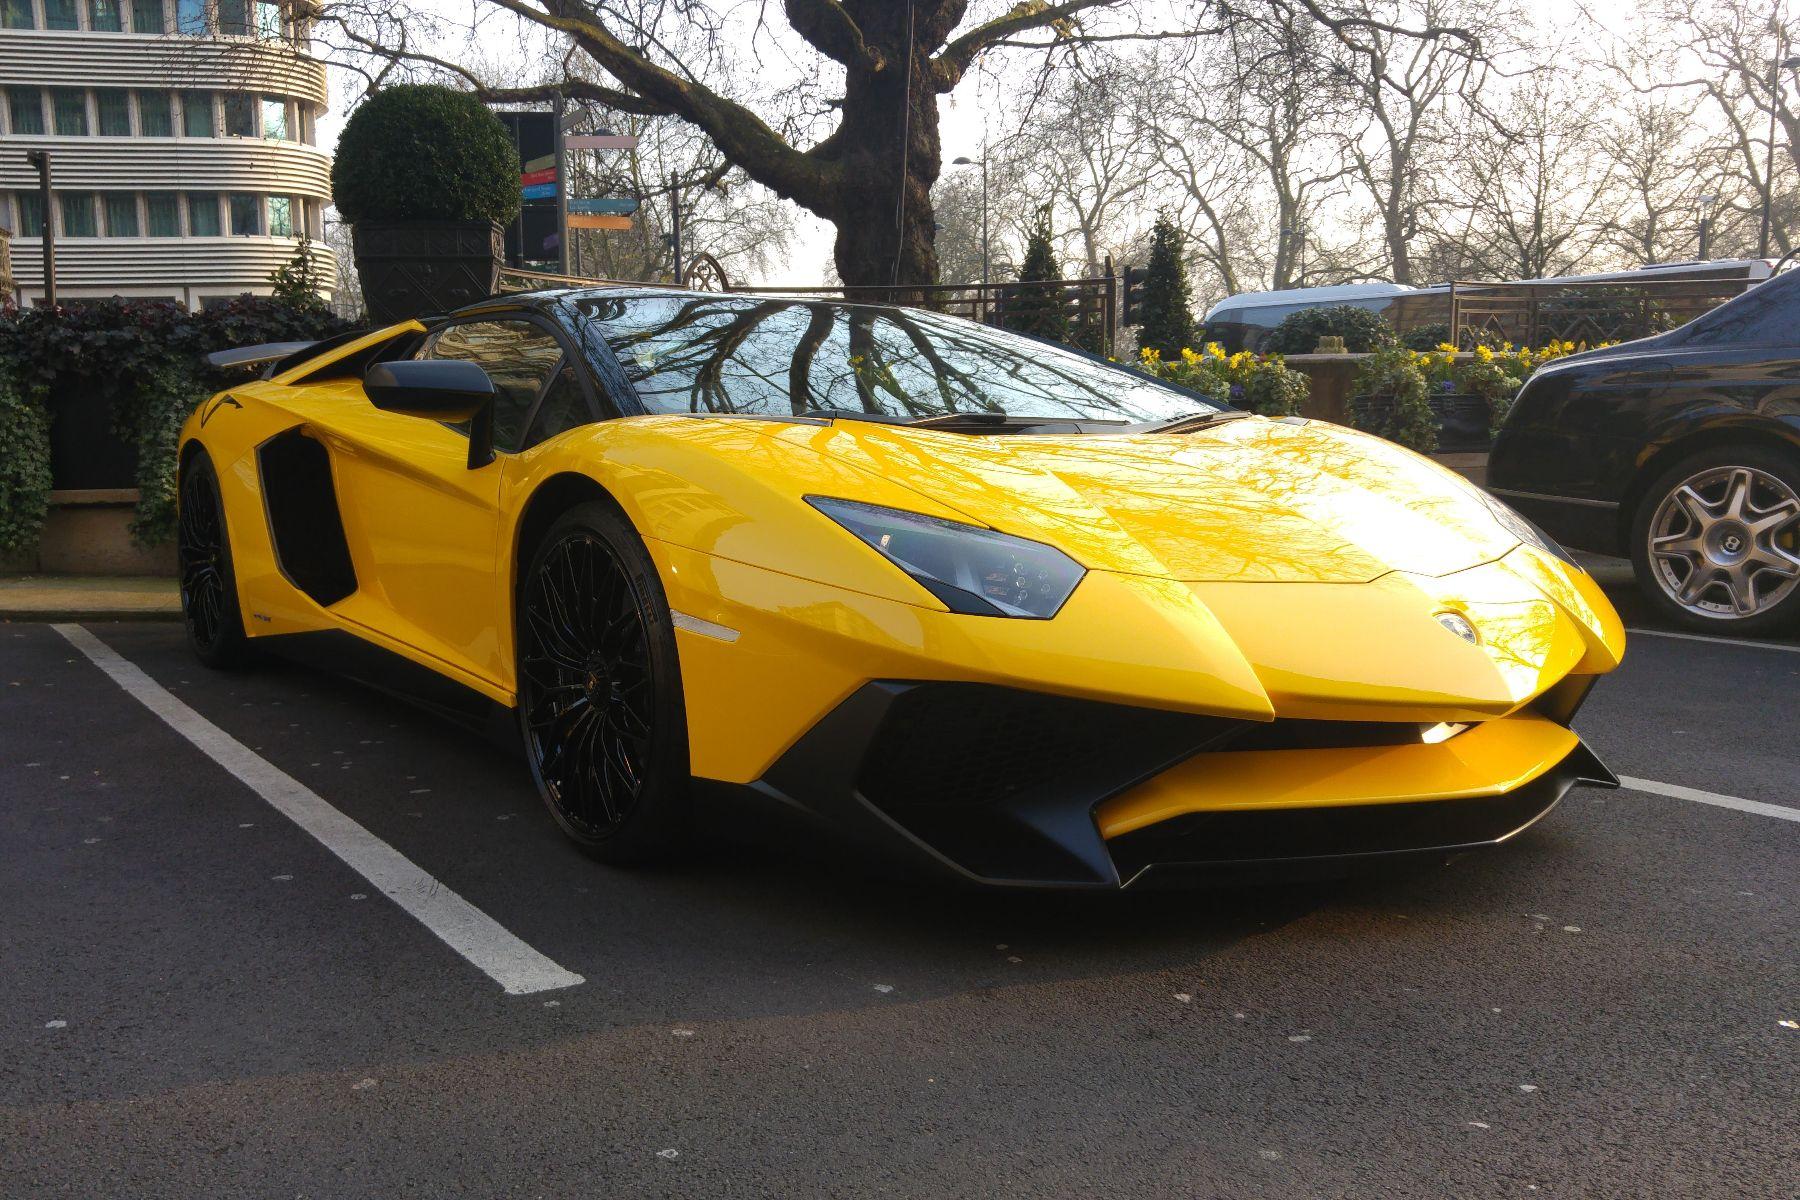 Supercar spotting instagram London